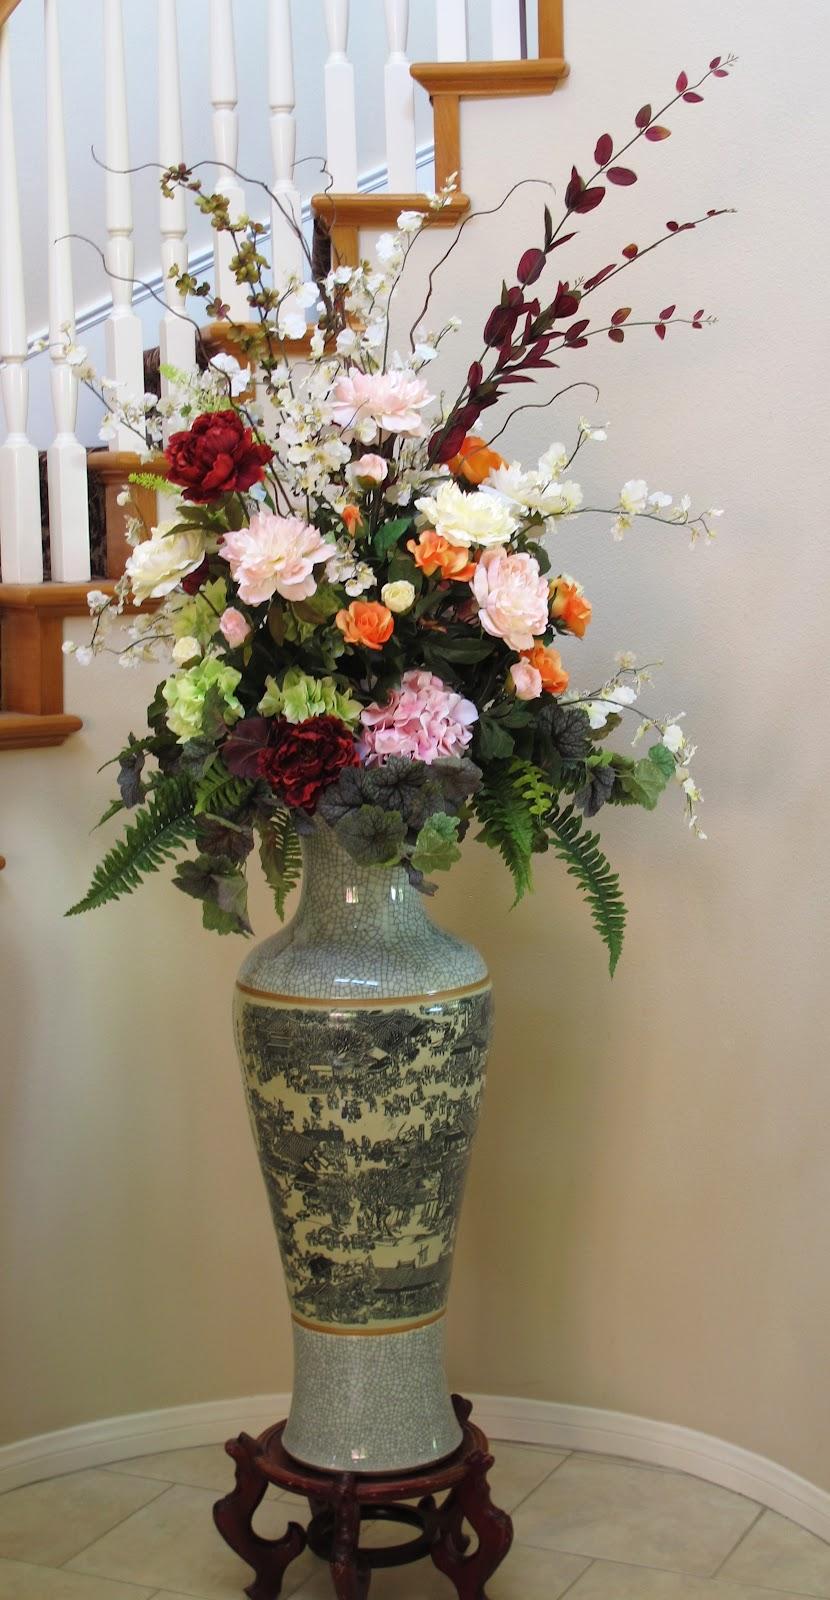 Pictures Of Silk Flower Arrangements - Beautiful Flowers